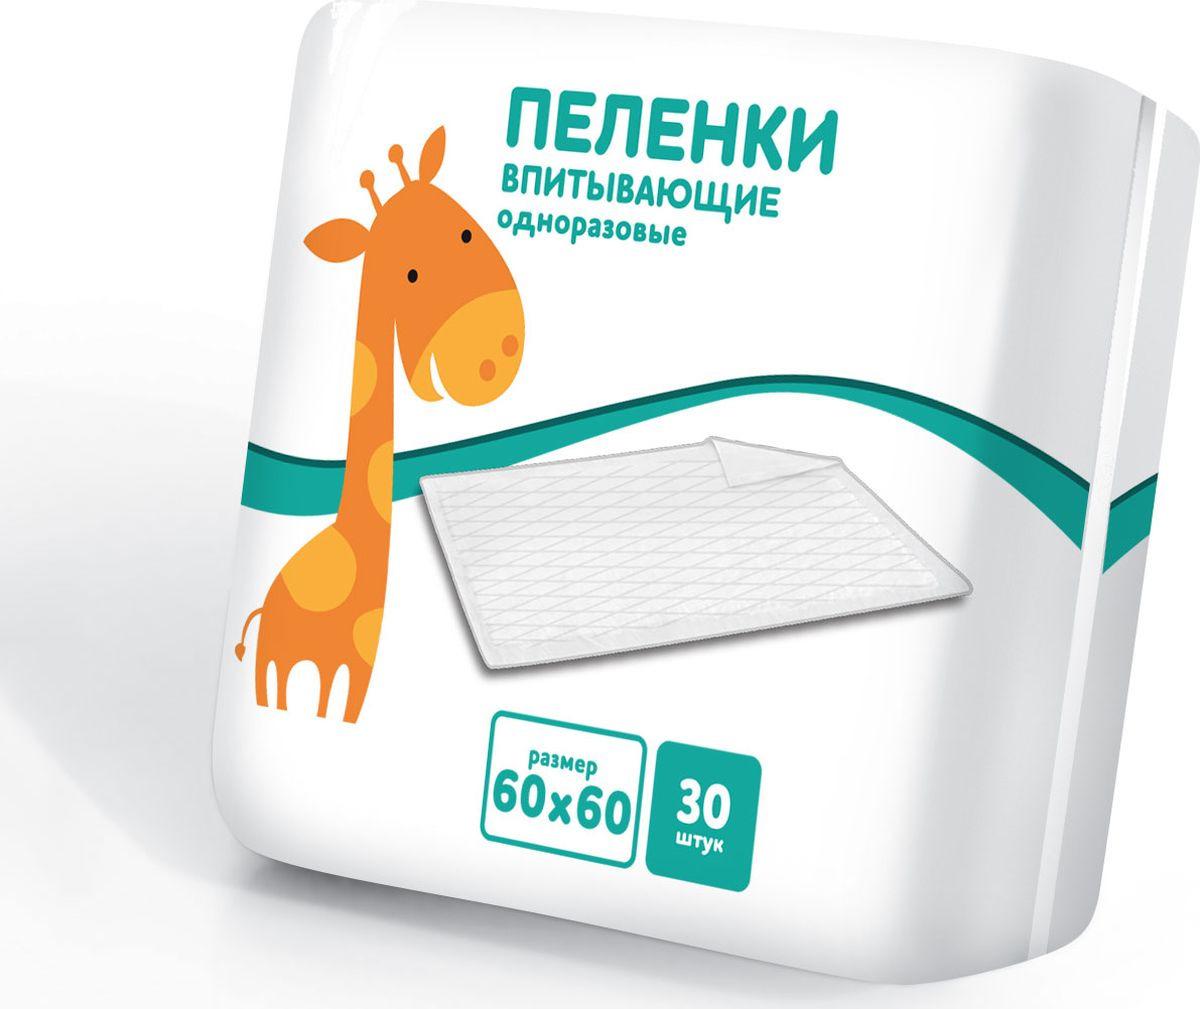 одноразовые пеленки Пеленки одноразовые Luxsan Жираф, 66.30, впитывающие, 60 х 60 см, 30 шт